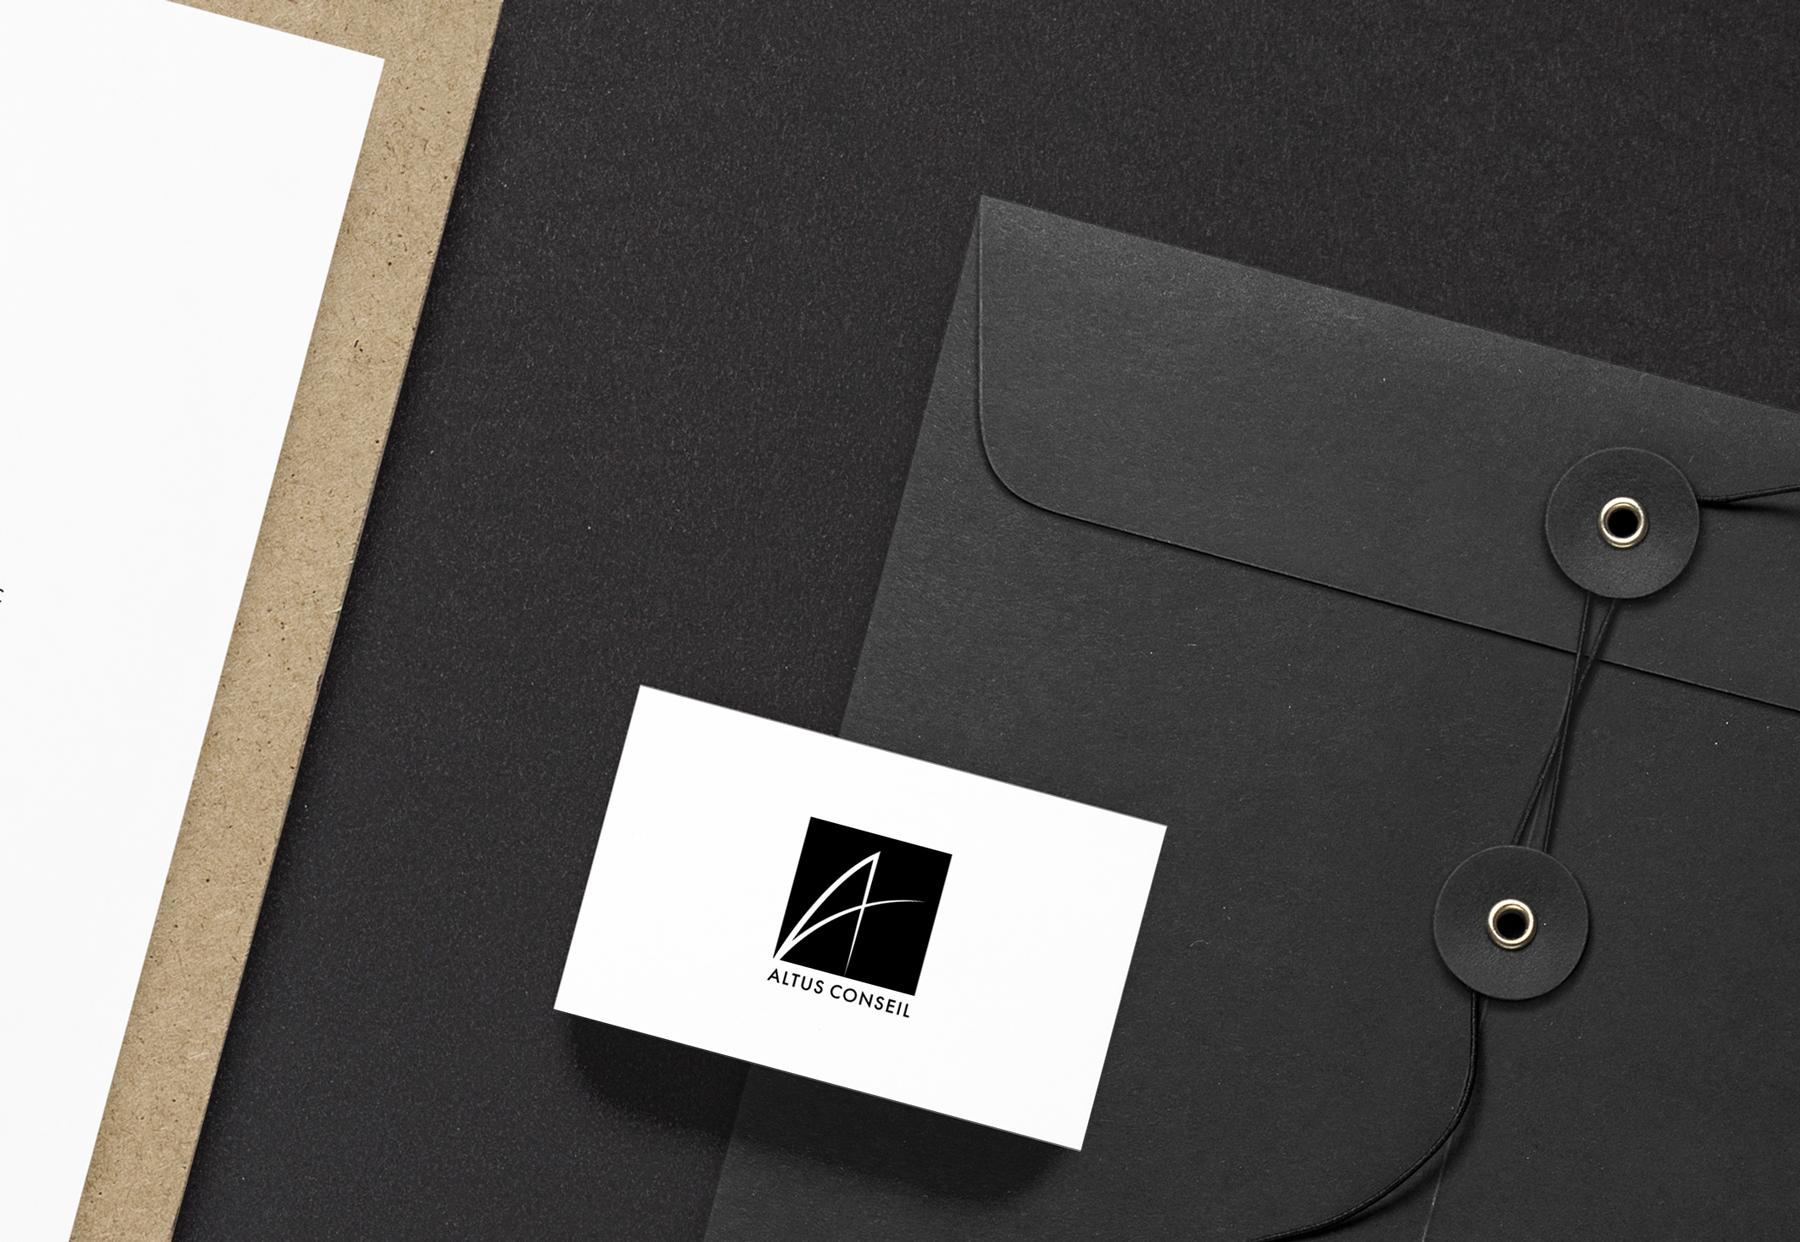 Altus_conseil_presentation_immobilier_logo_investissement_03